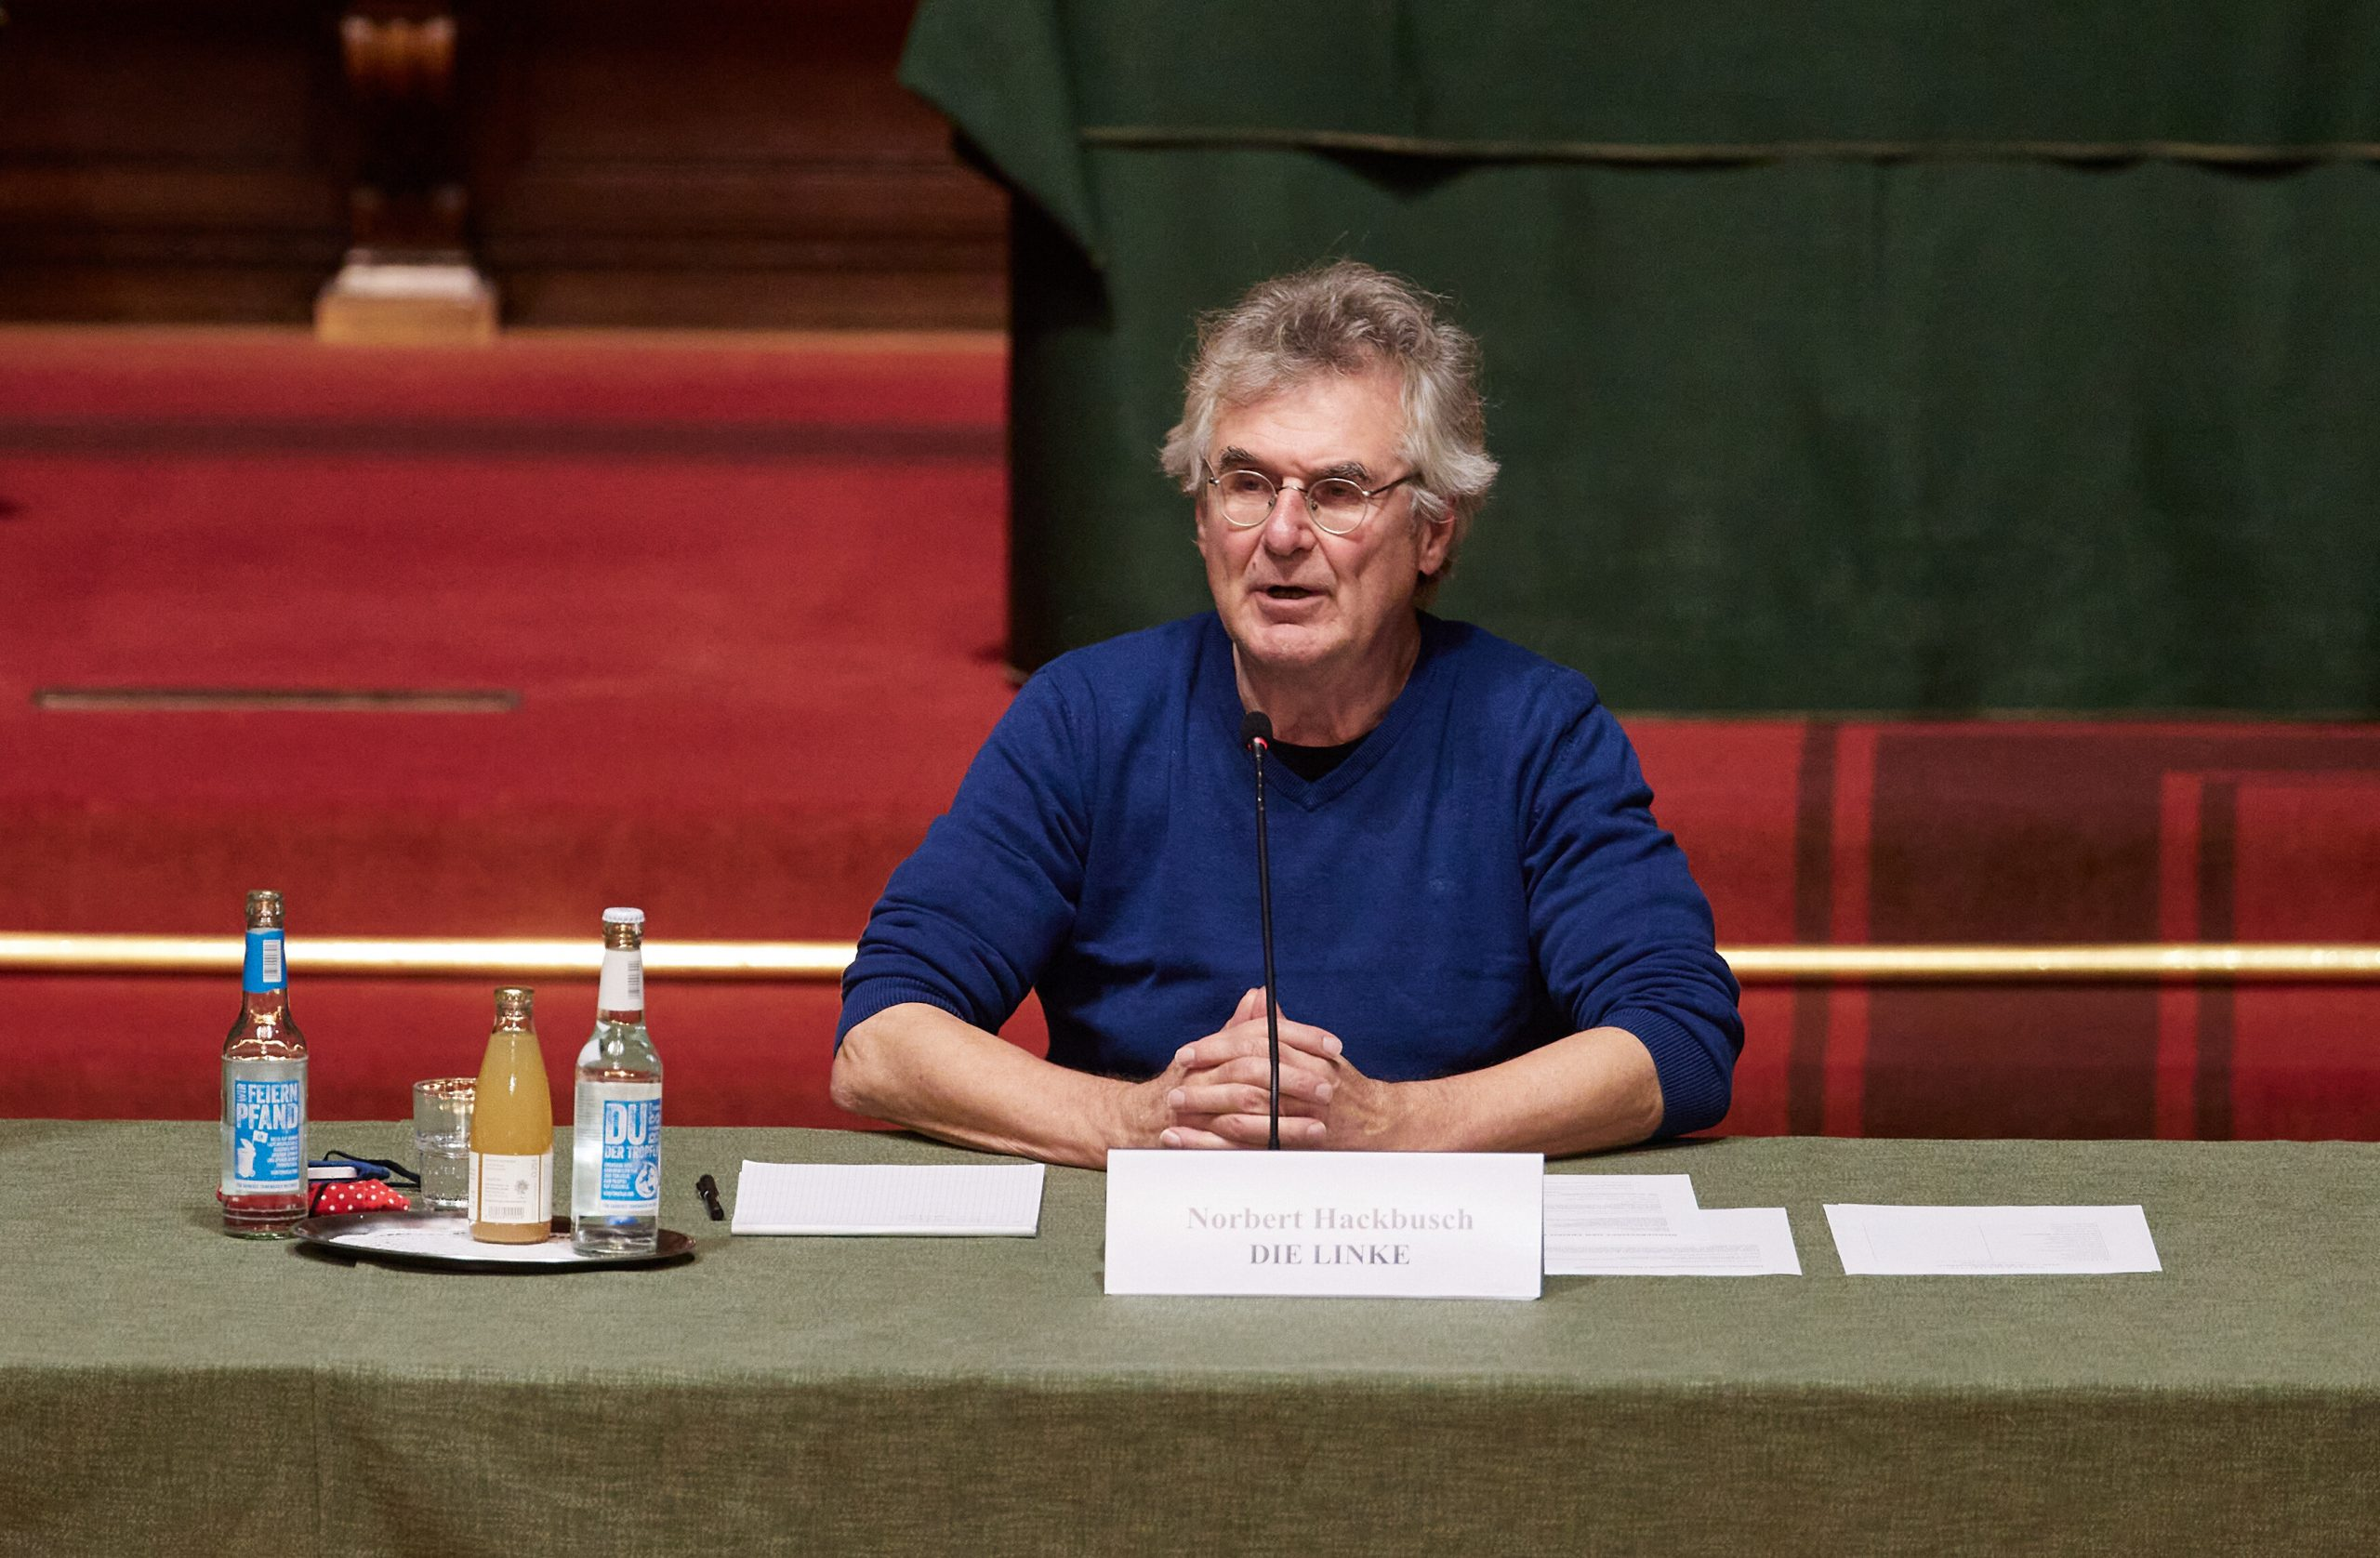 Norbert Hackbusch (Linke) Obmann im Parlamentarischen Untersuchungsausschuss zum Cum-Ex-Skandal (Archivbild).